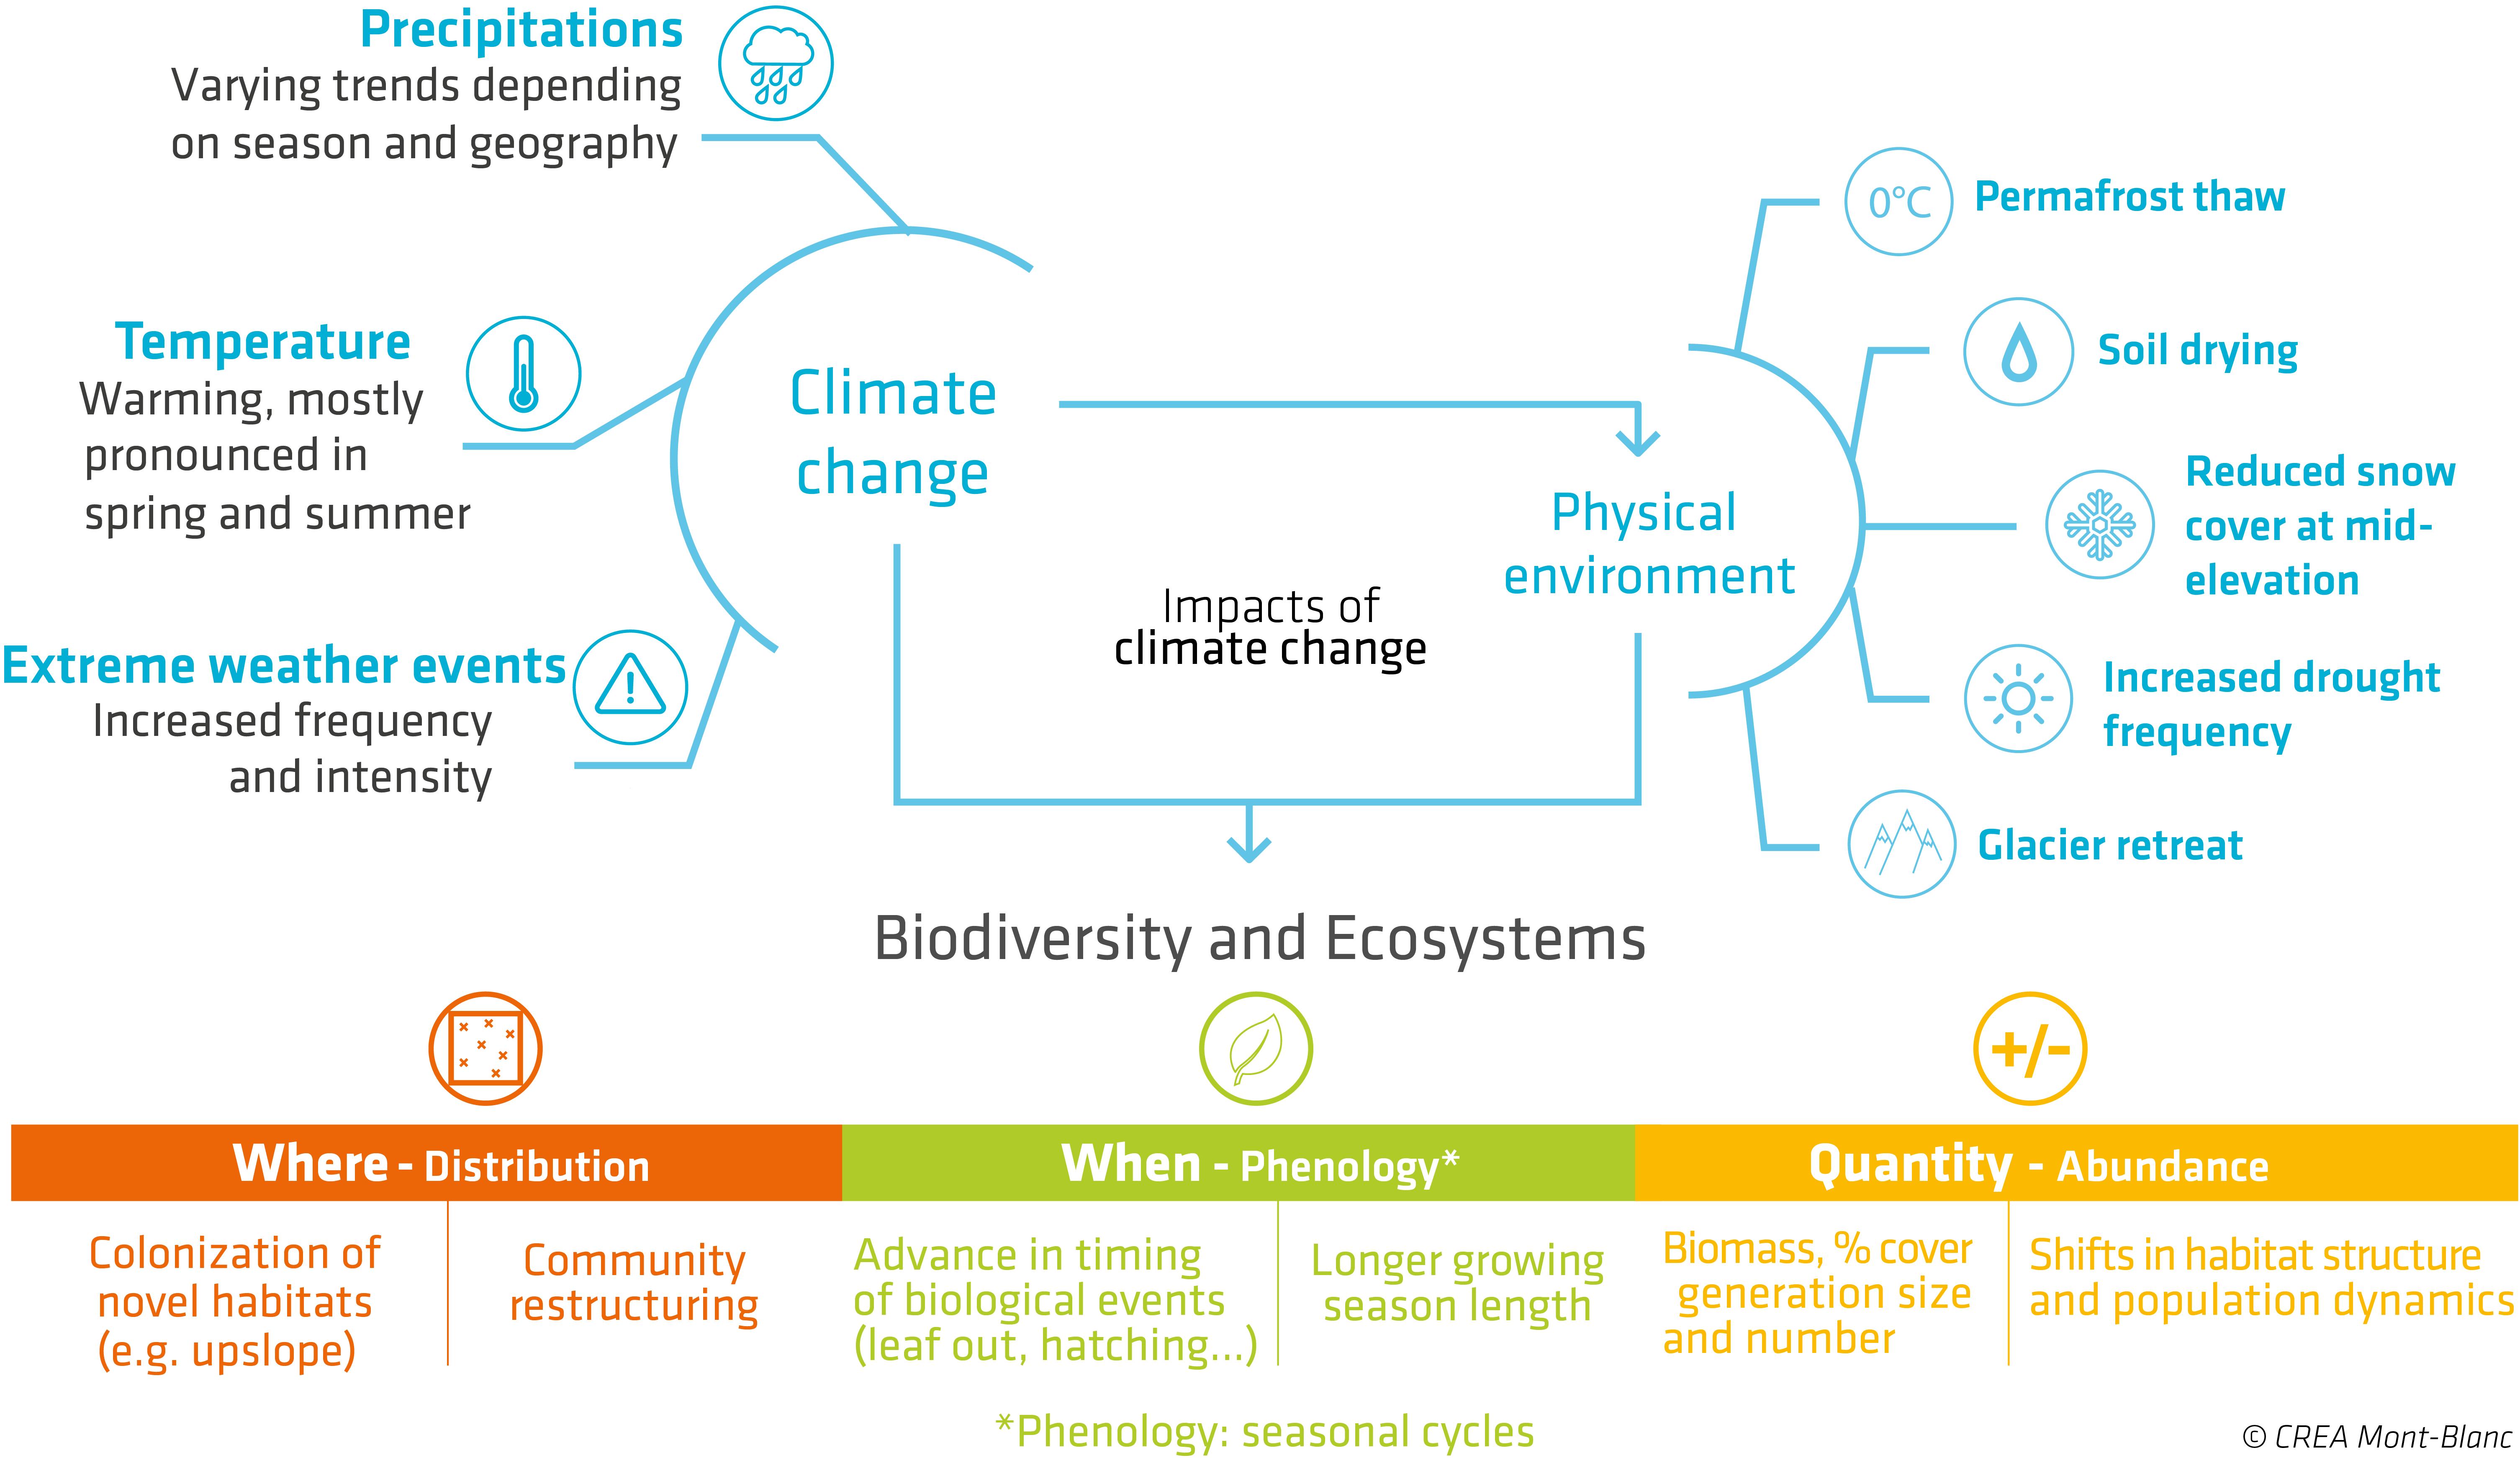 schema_global_impact_cc_biodiv_creamontblanc_en.png